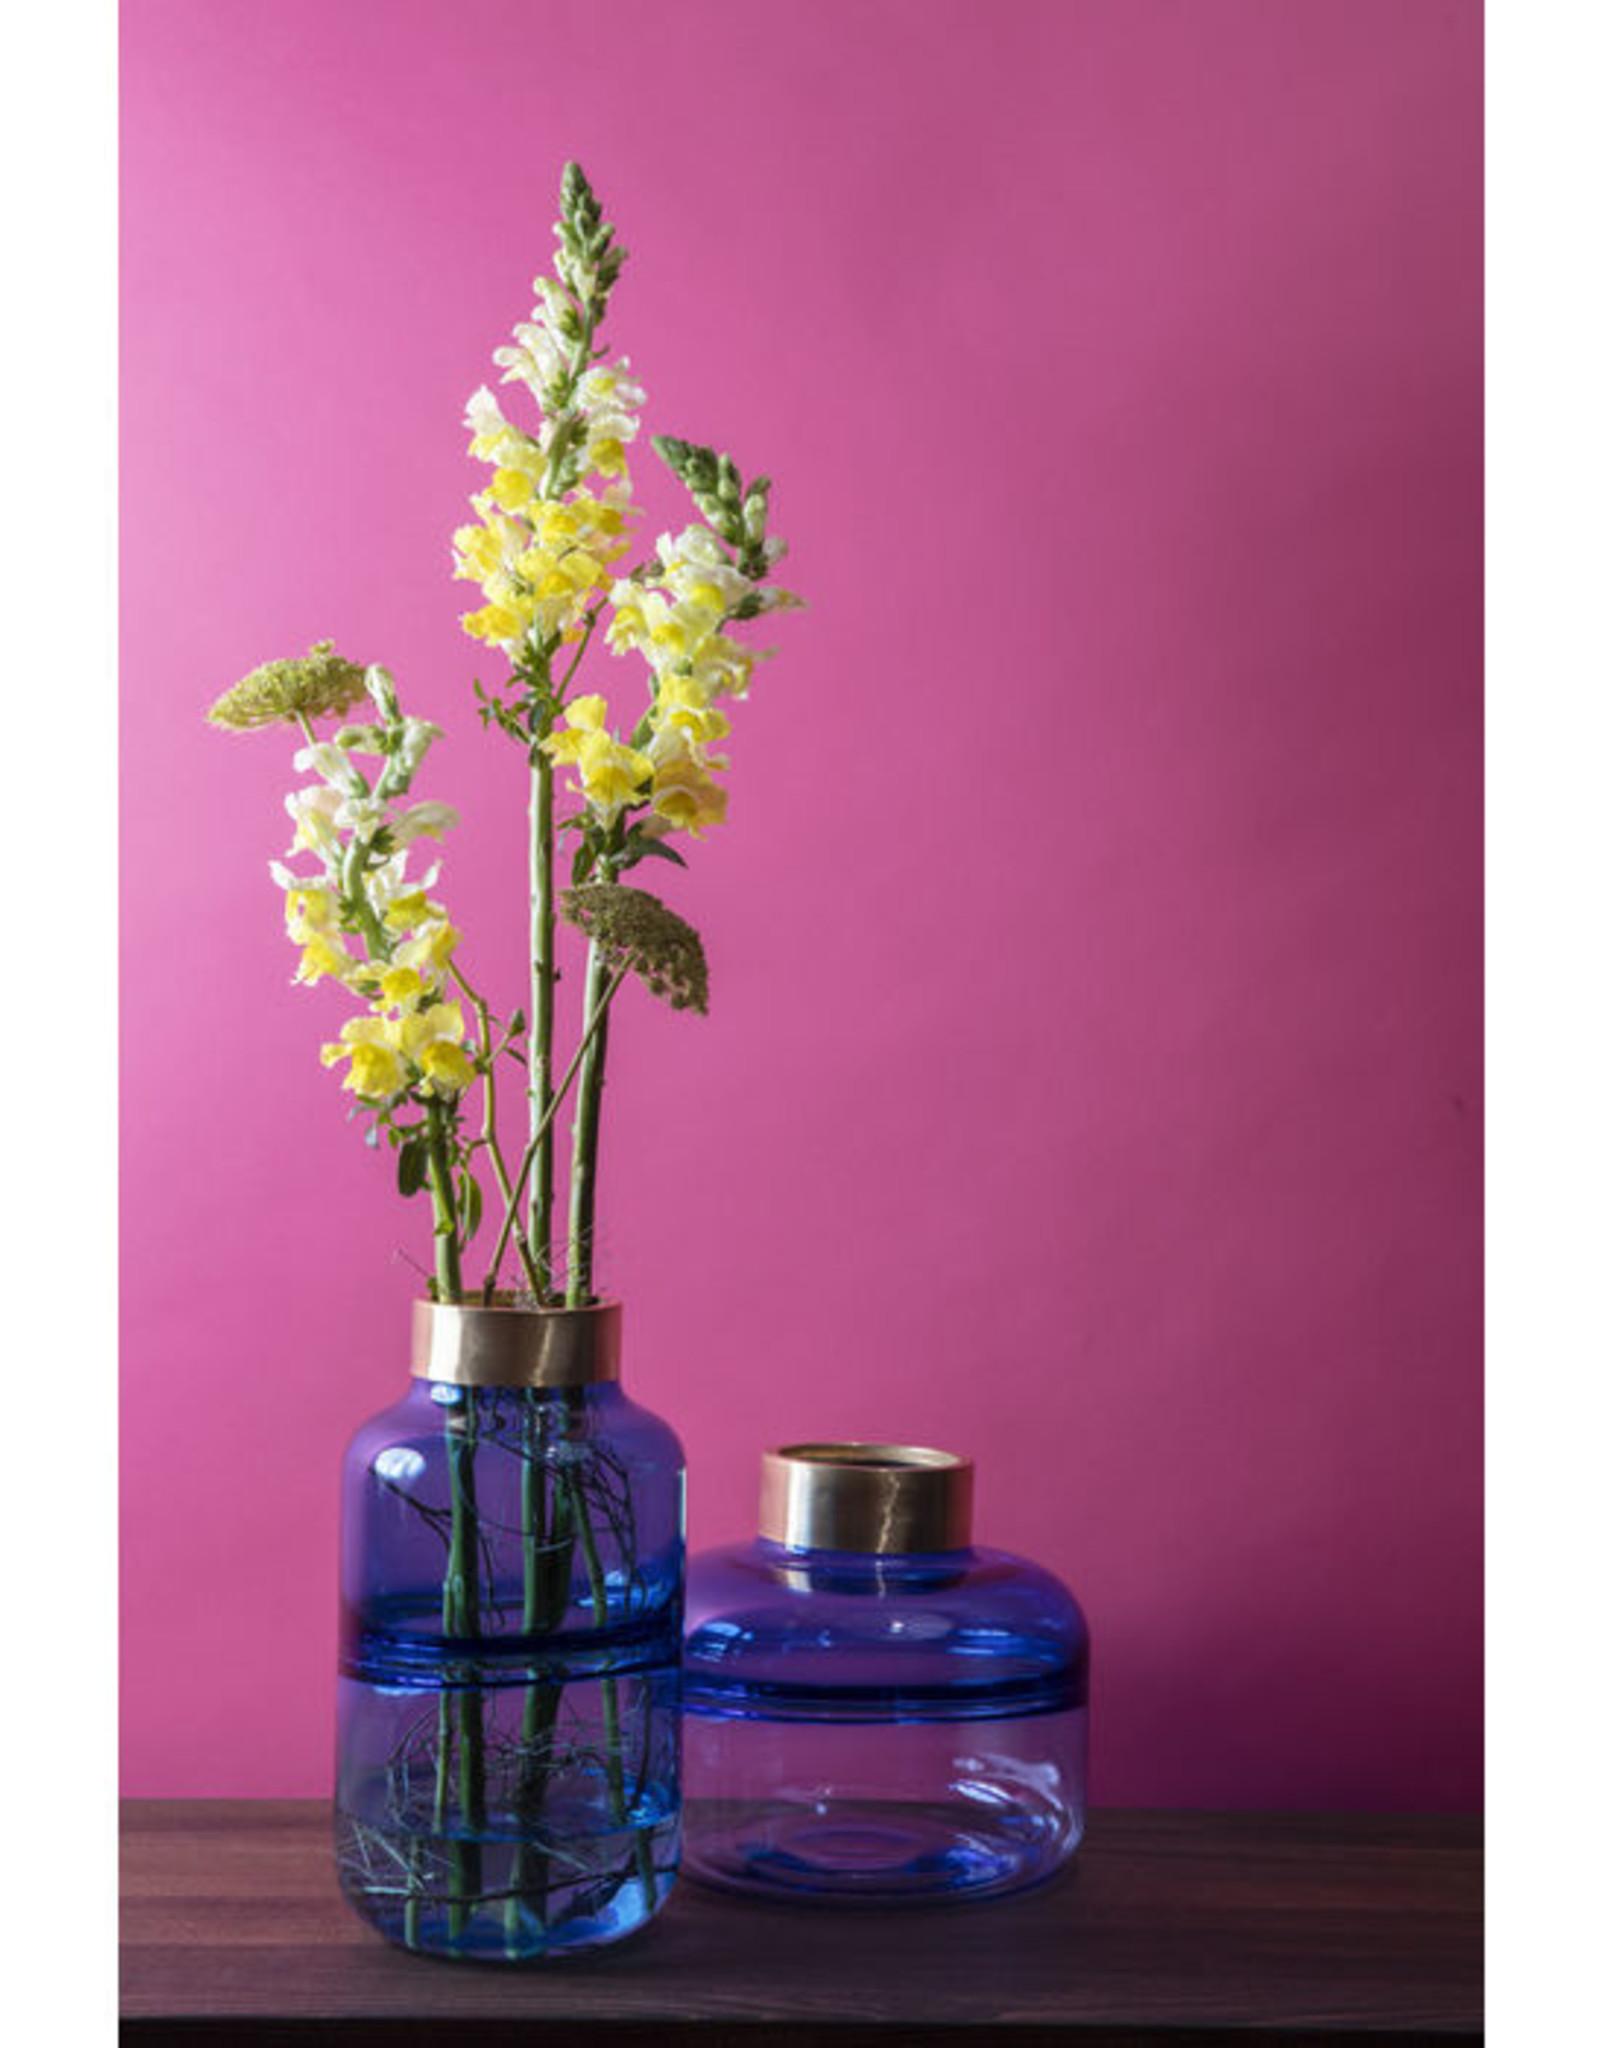 KARE DESIGN Vase Positano Belly Blue 21 cm